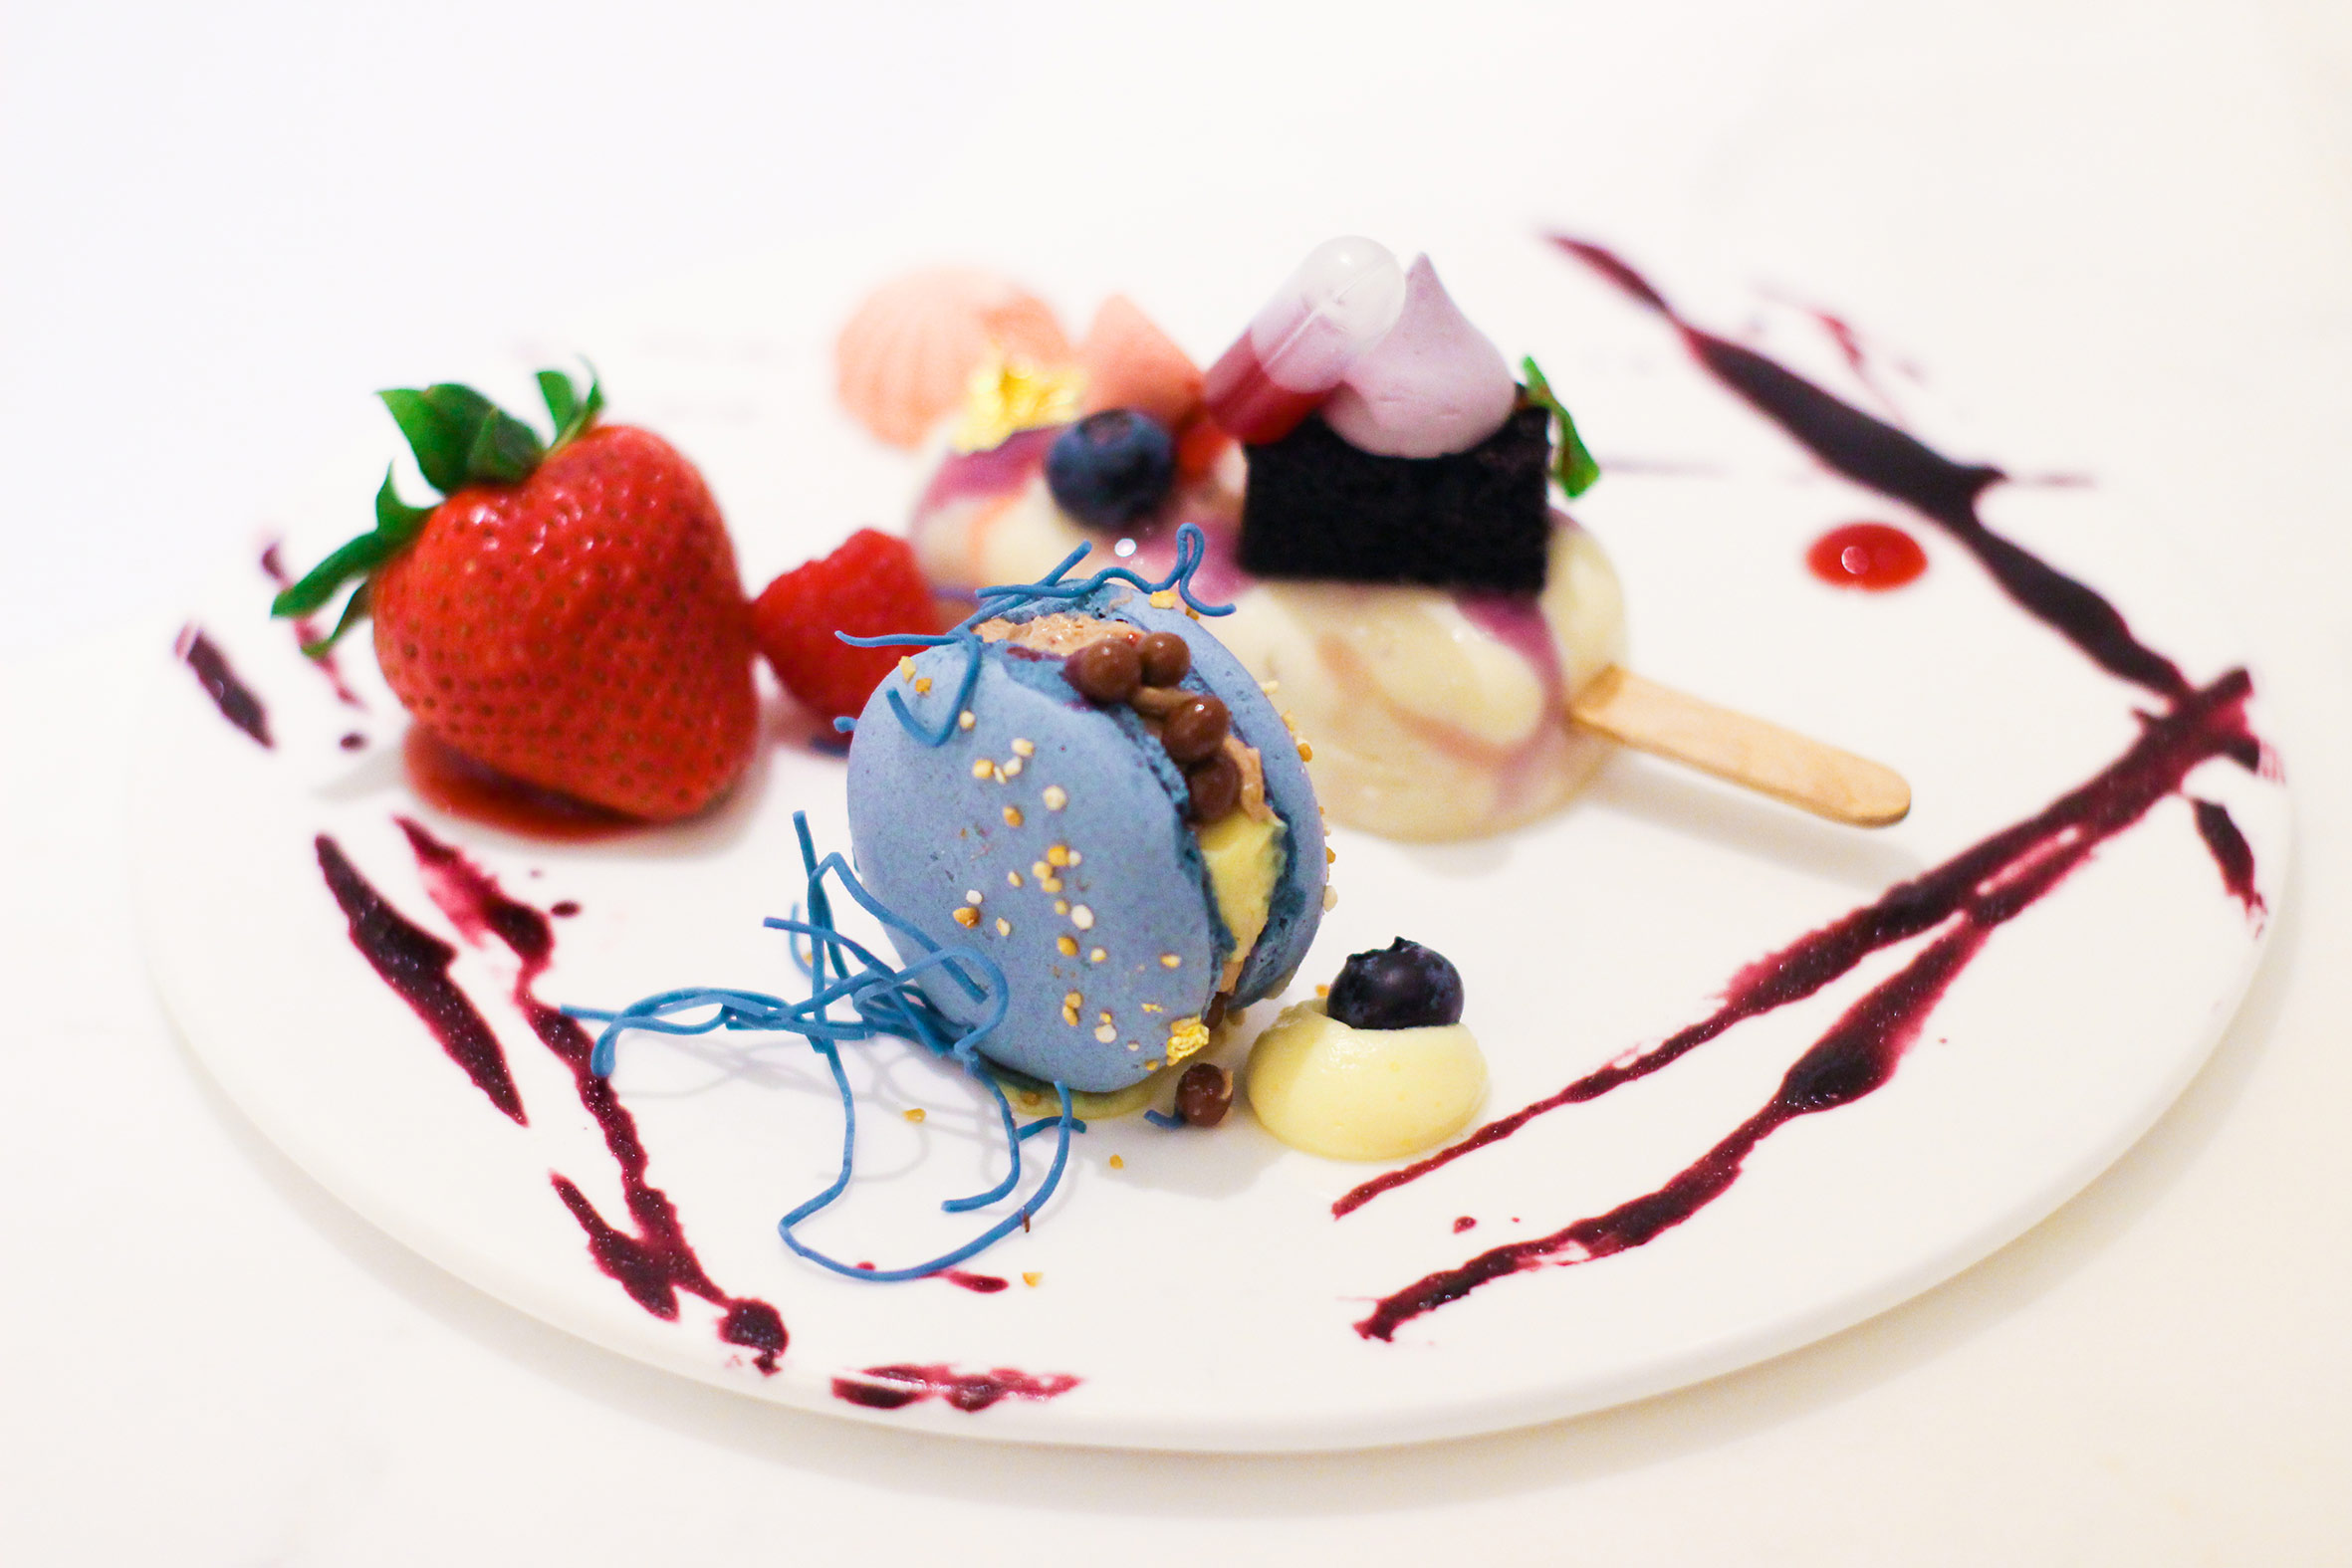 Shangri-La at the Fort's dessert platter